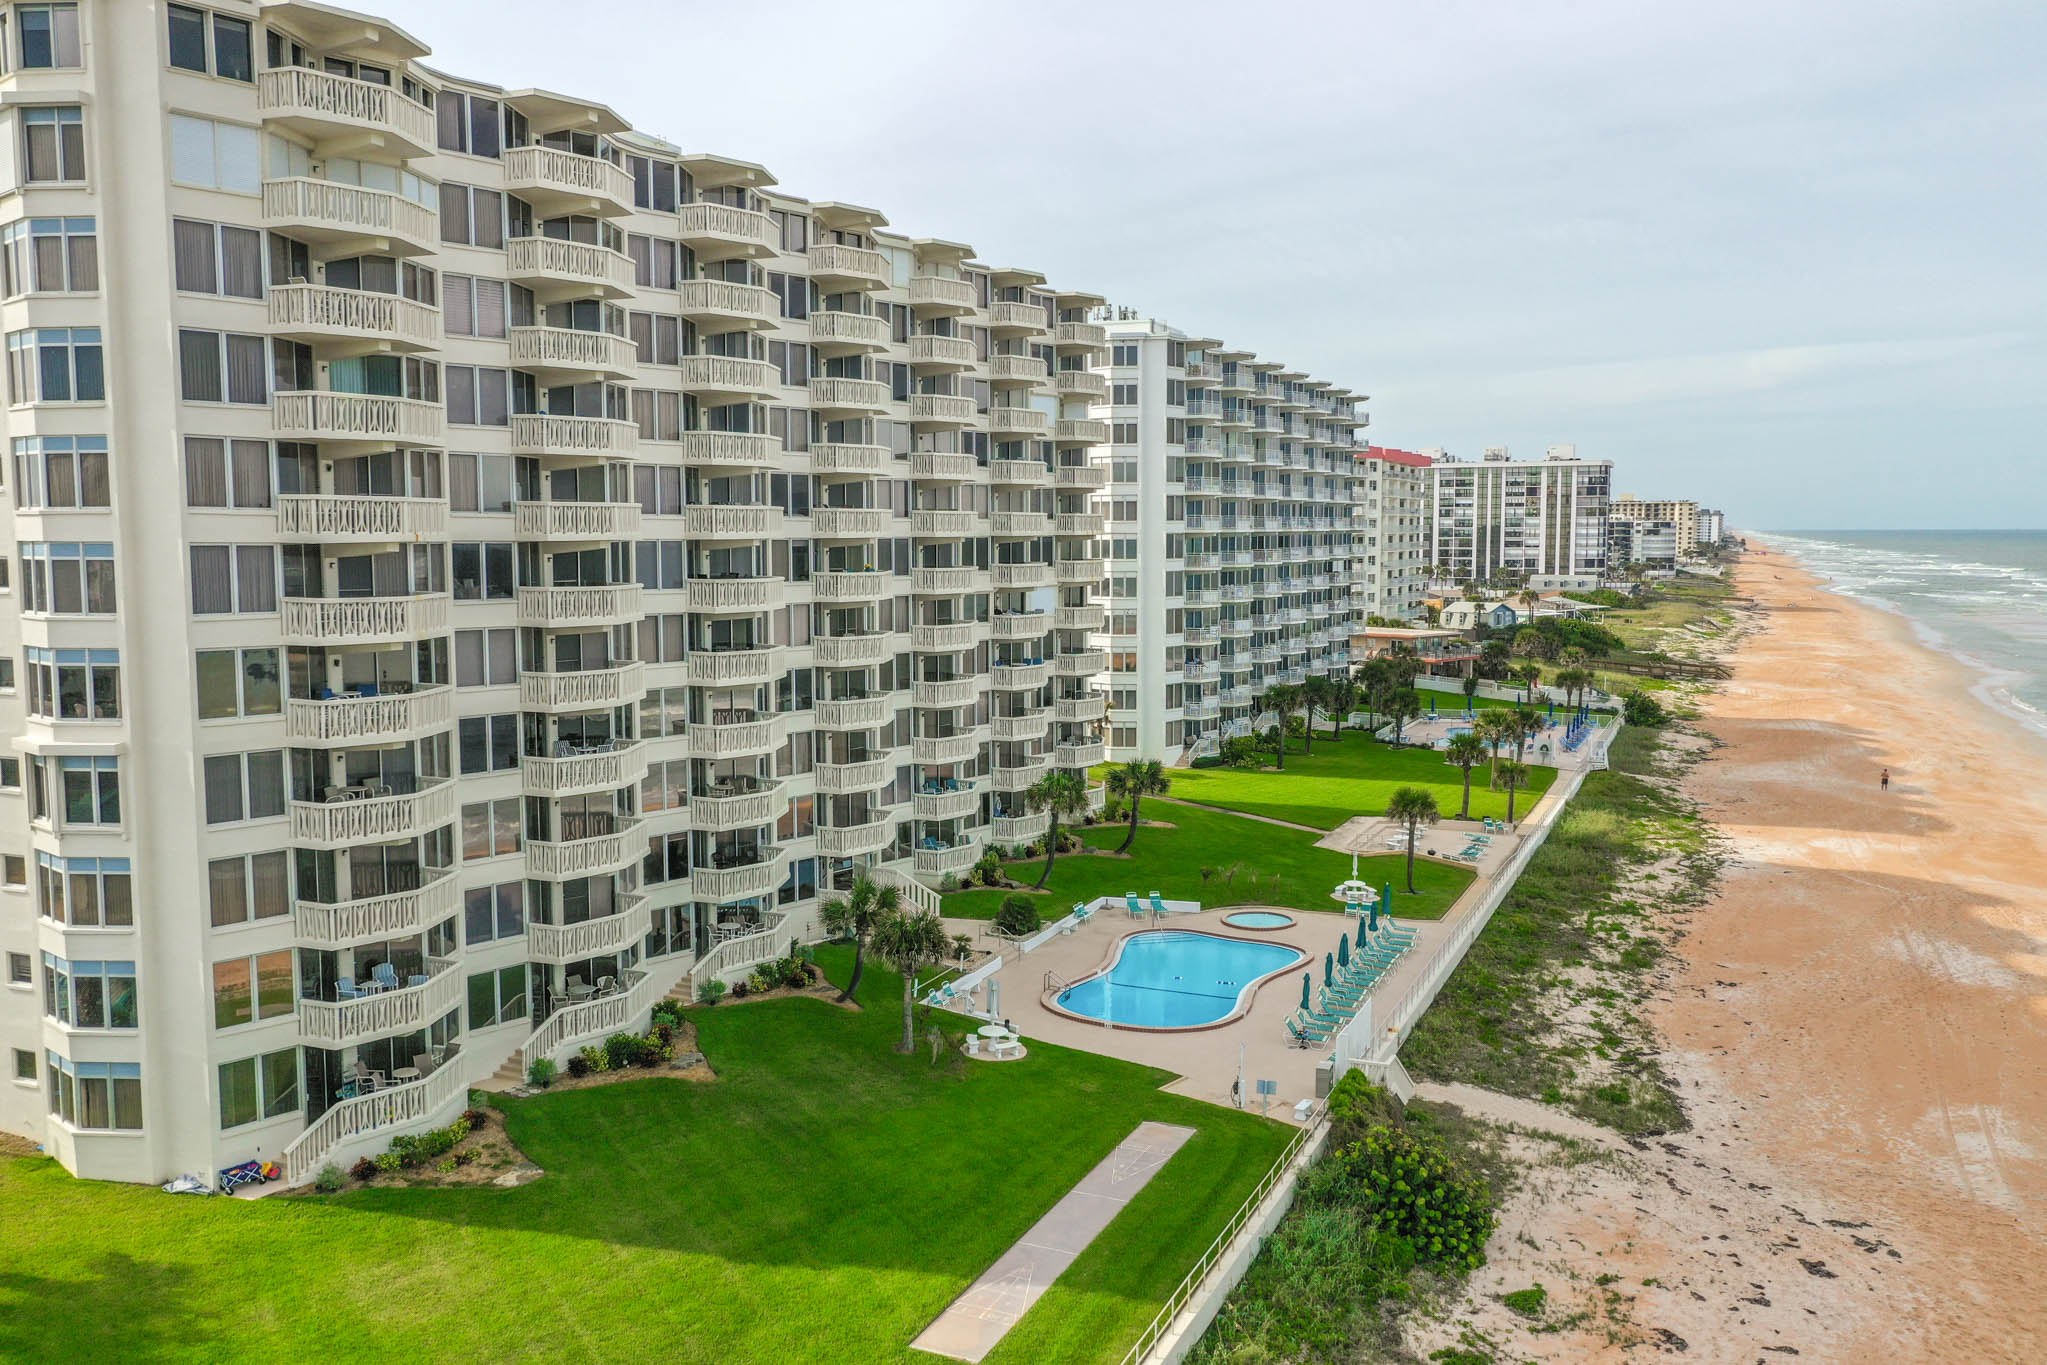 Daytona Beach Condo Sales Slipped Again in September